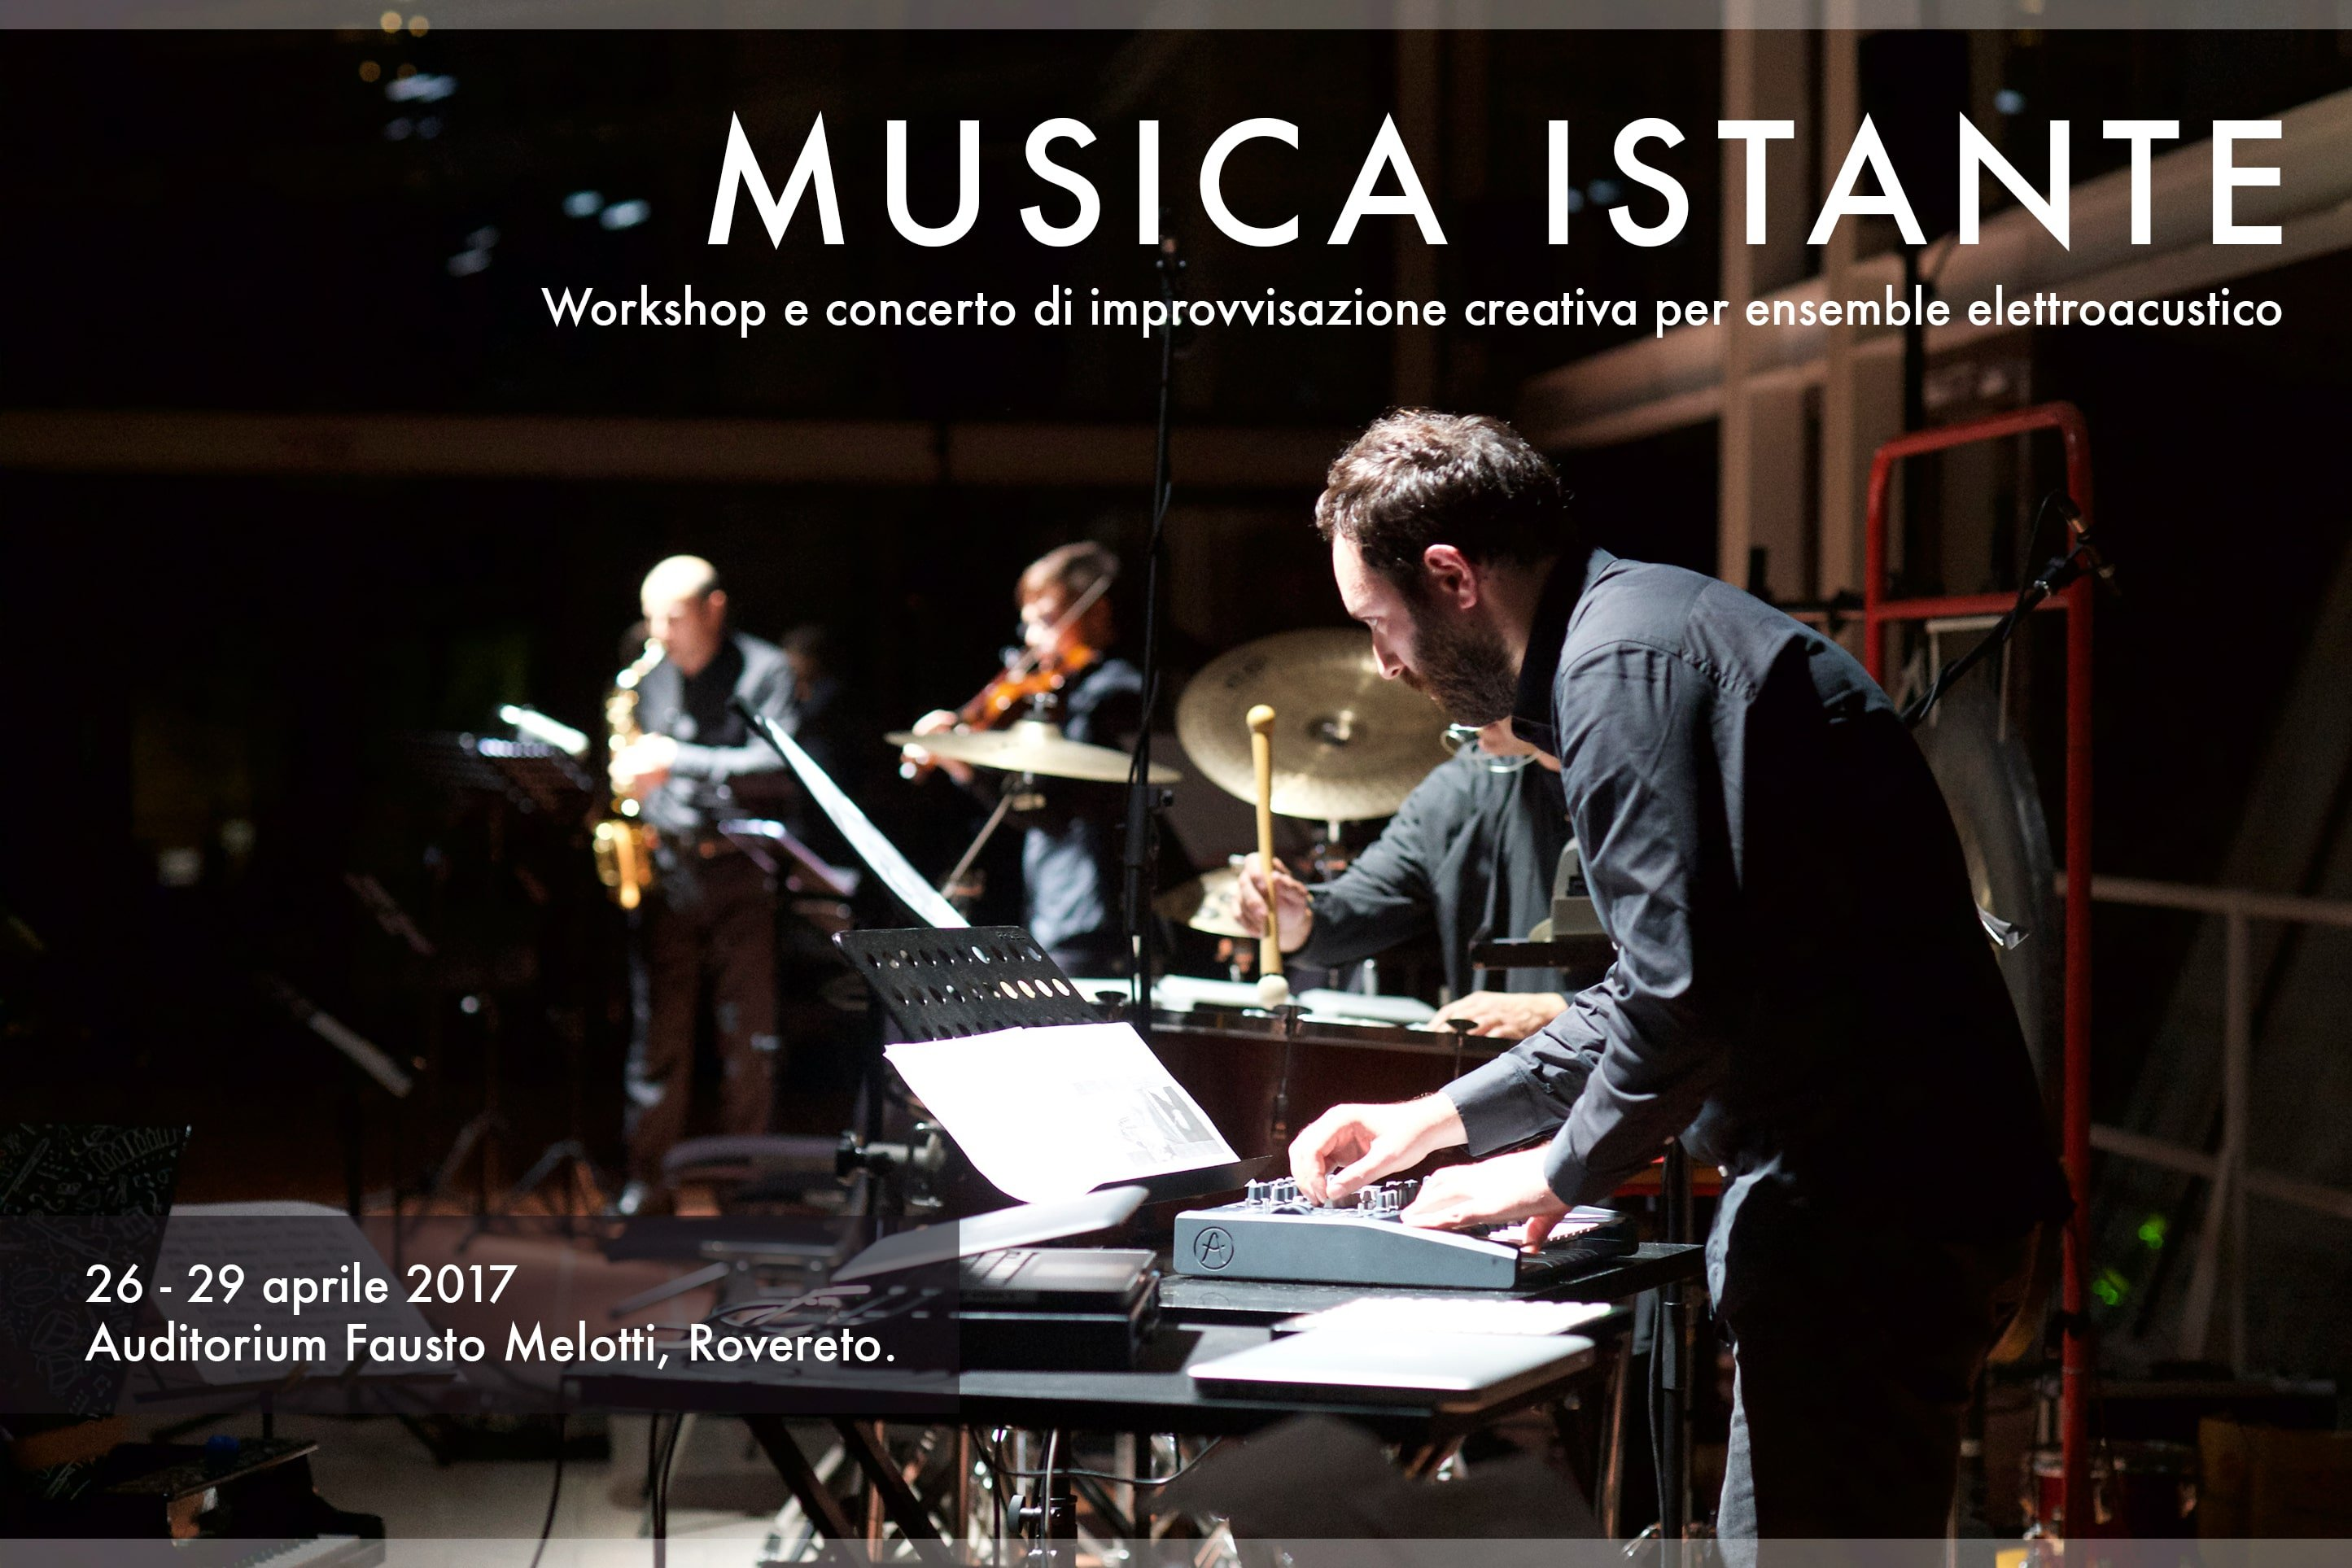 images/Musica_Istante_Rovereto.jpg